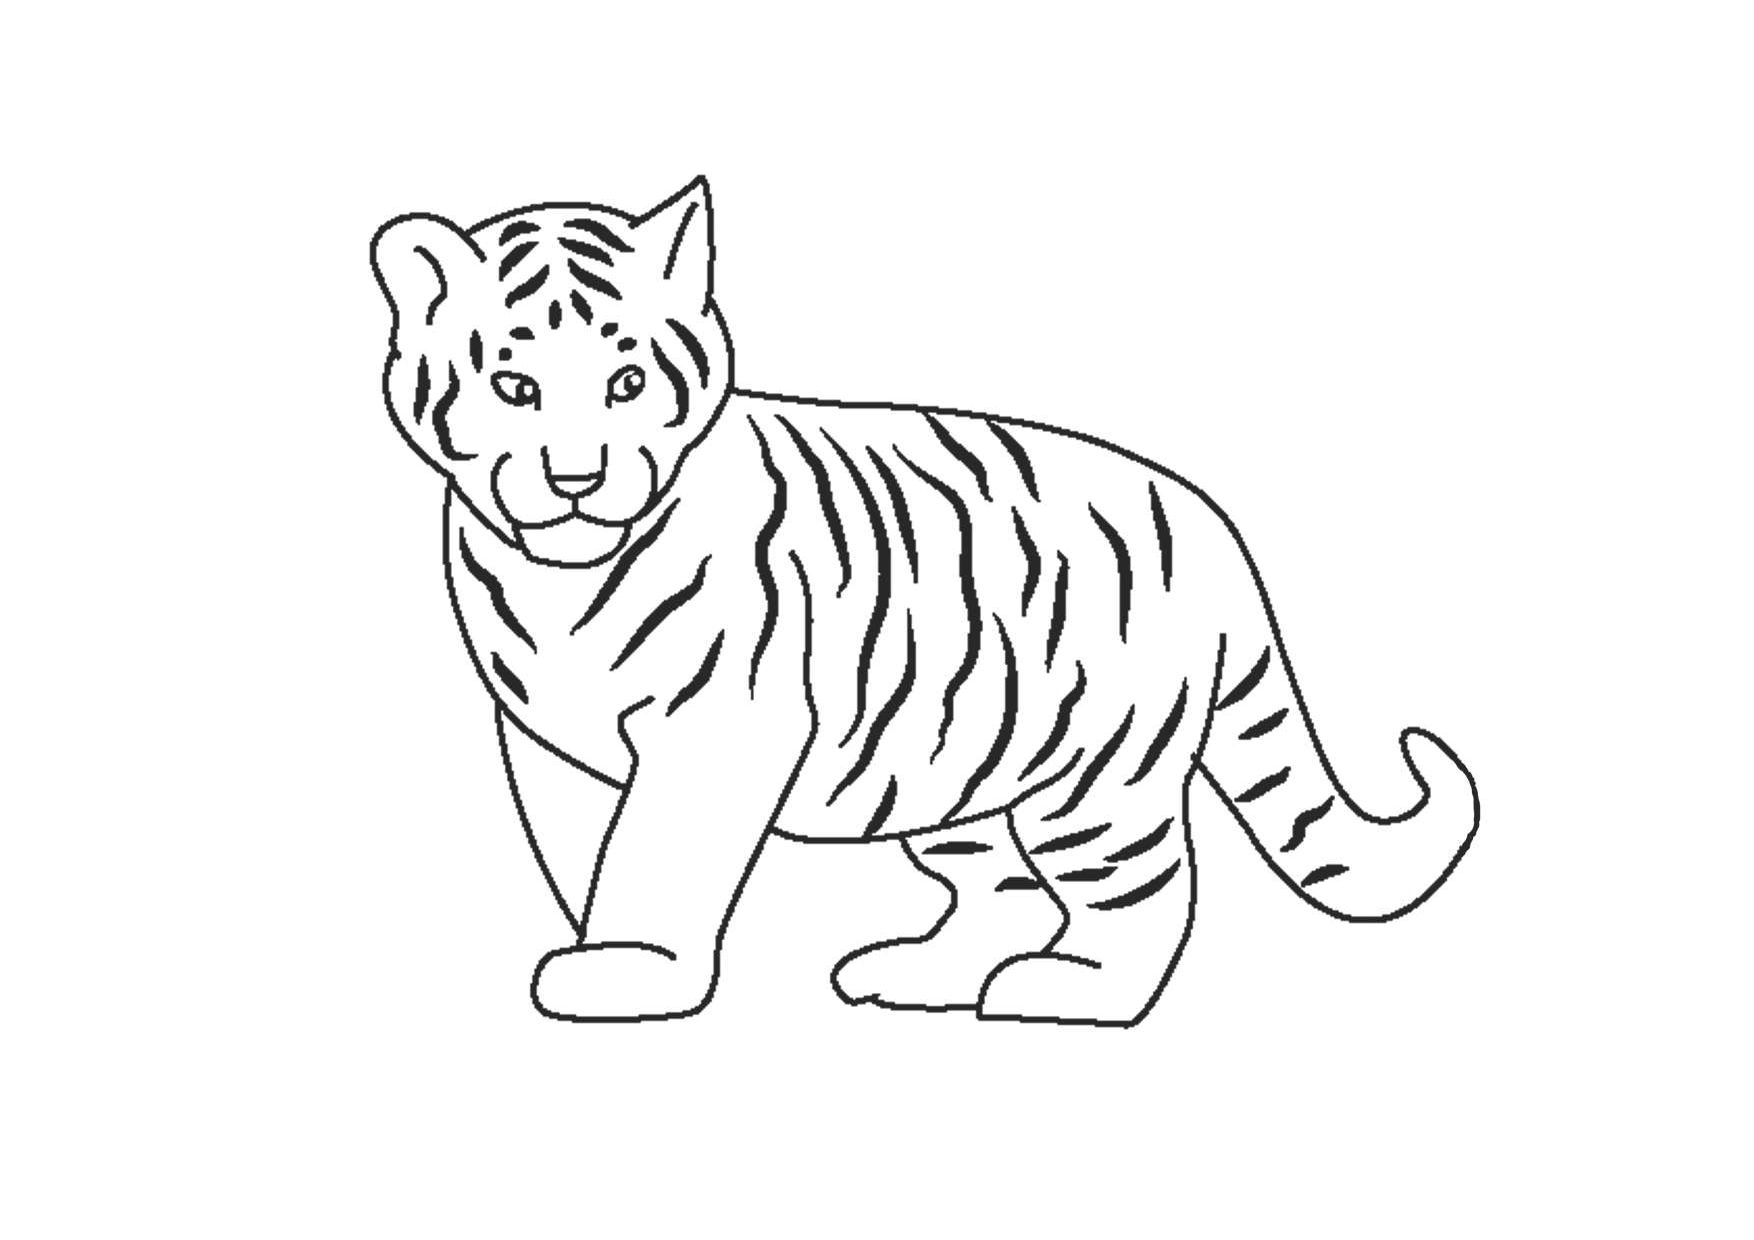 Tranh tô màu con hổ con